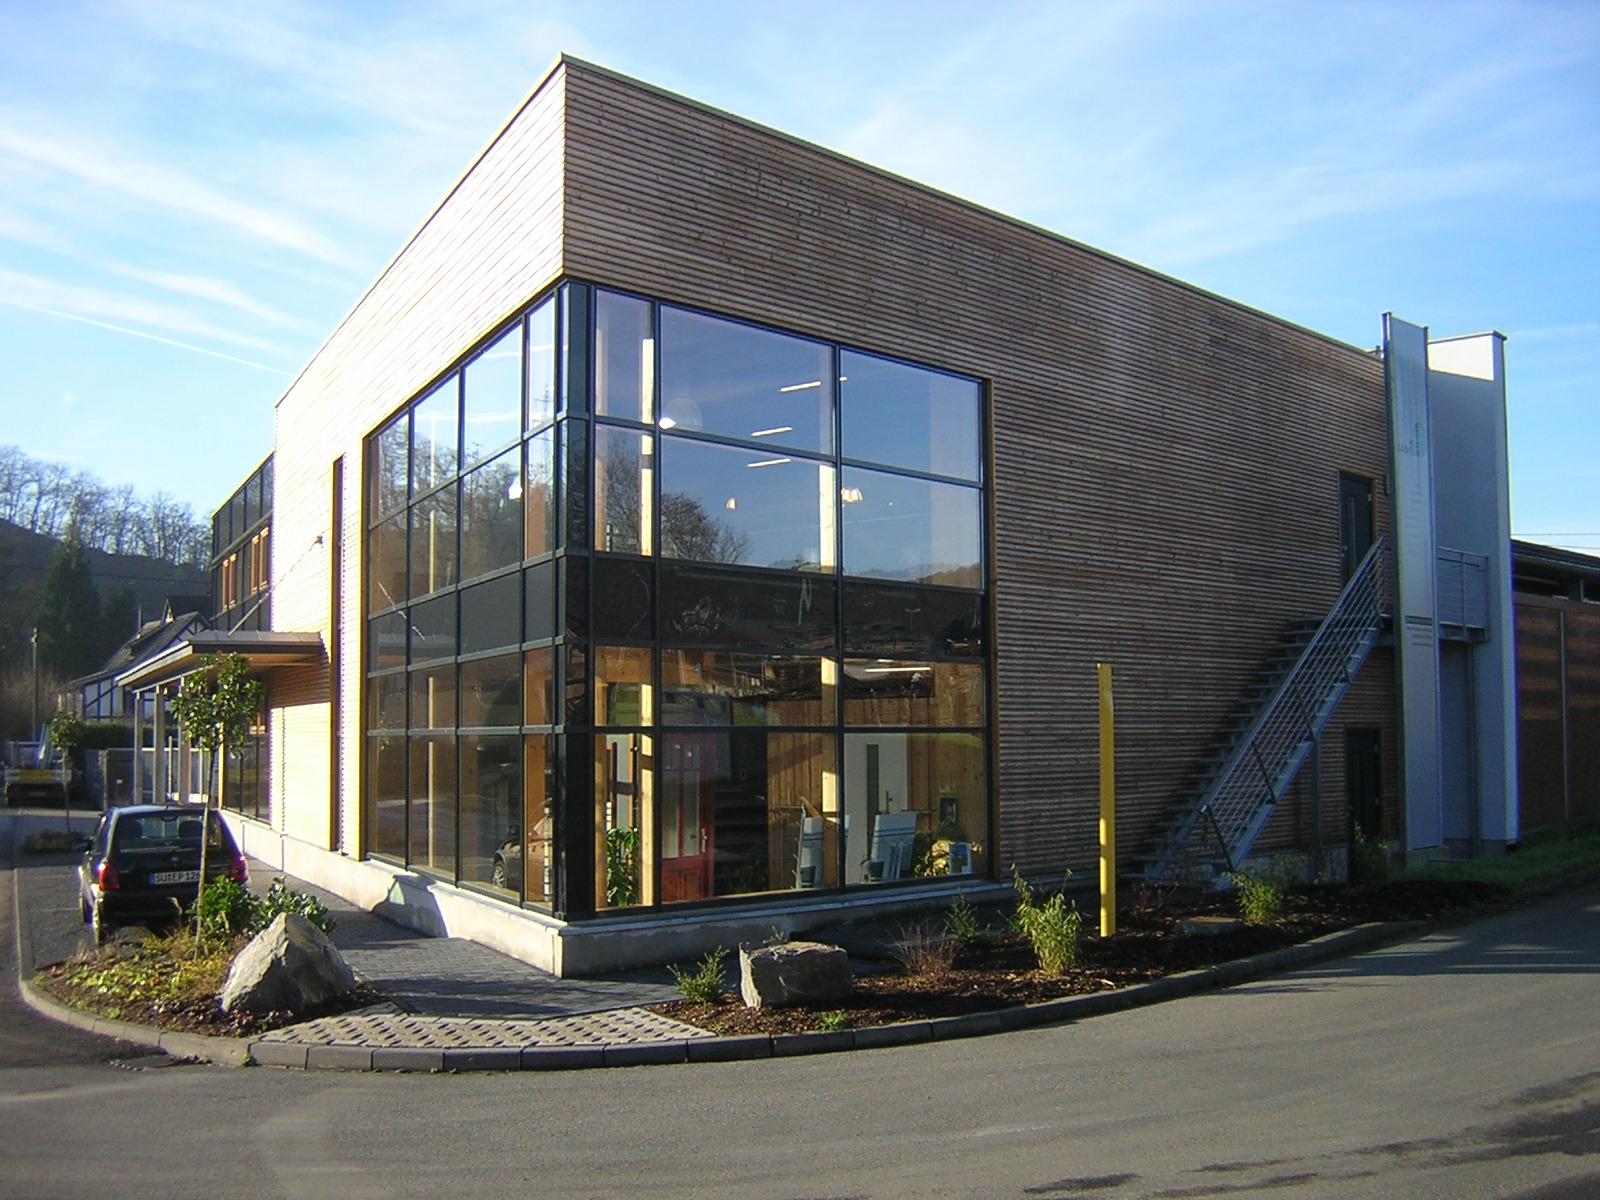 Holz Langen: Ausstellungsgebäude